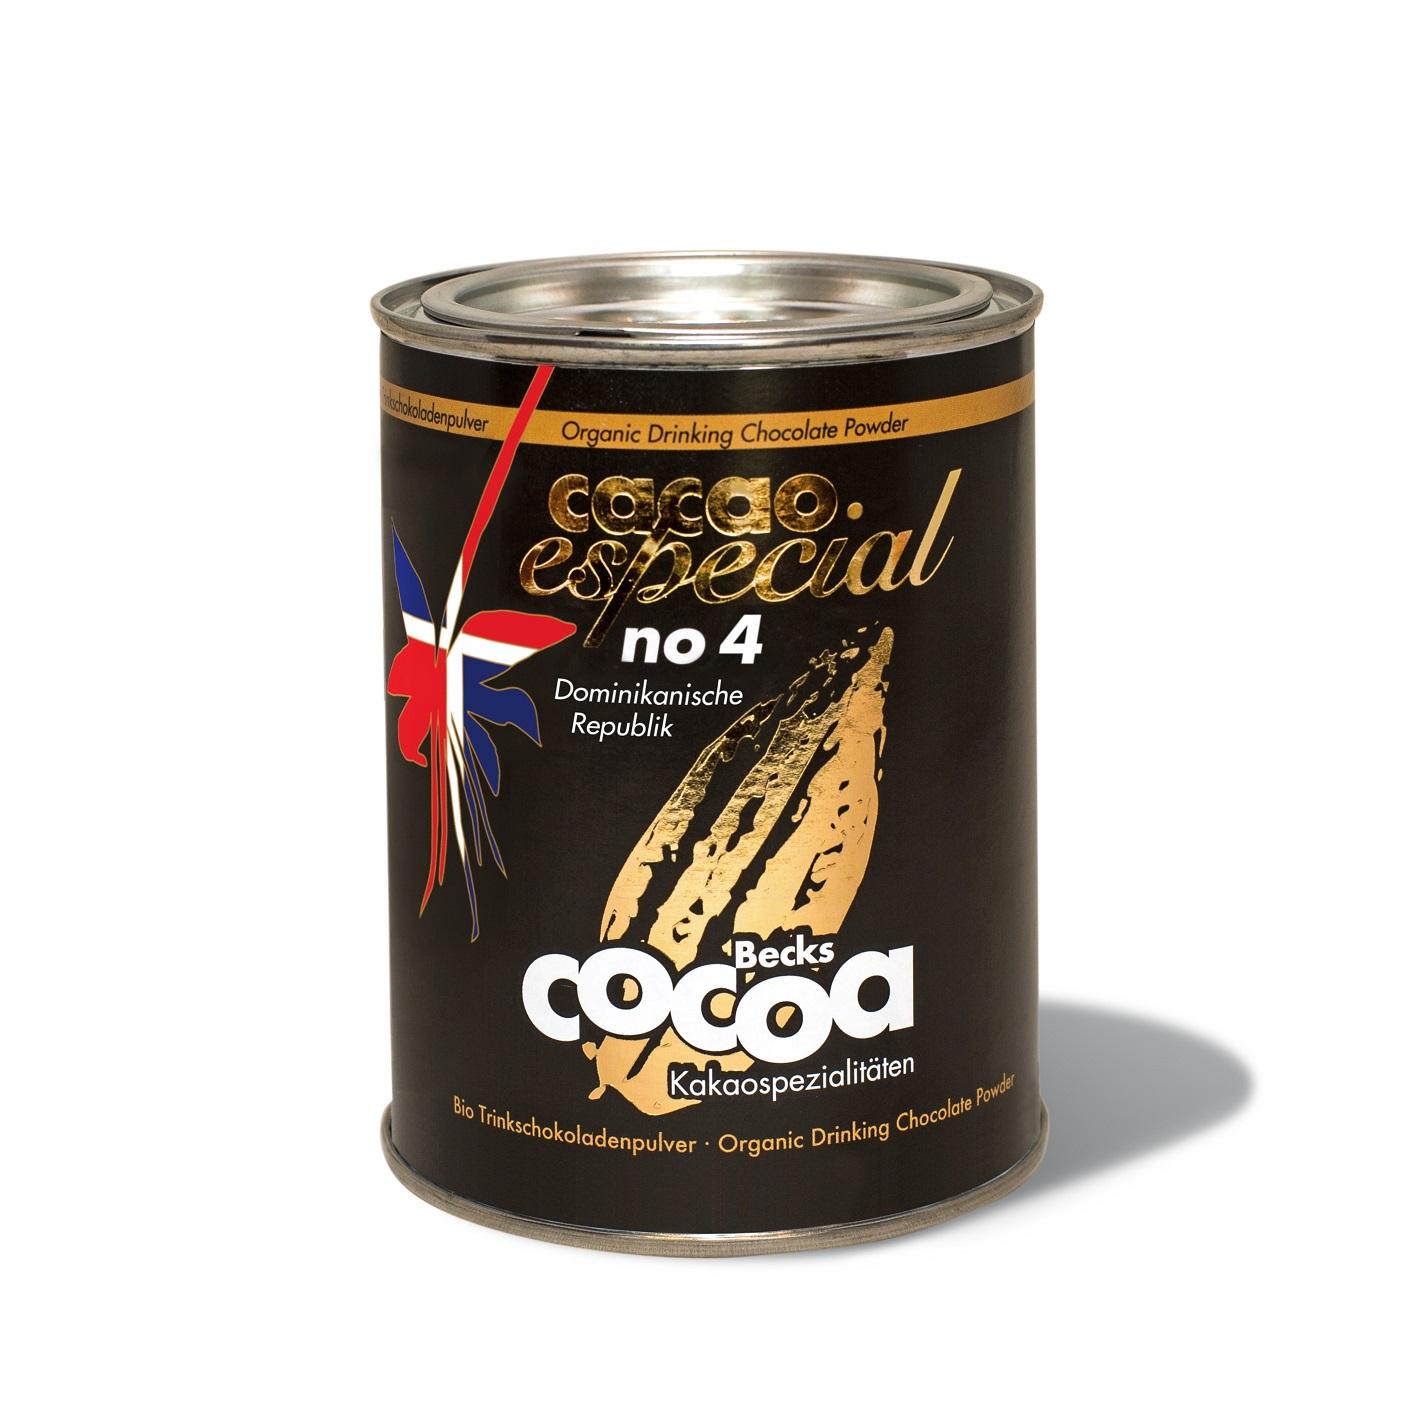 Becks Cocoa Especial No4 Dominikanische Republik